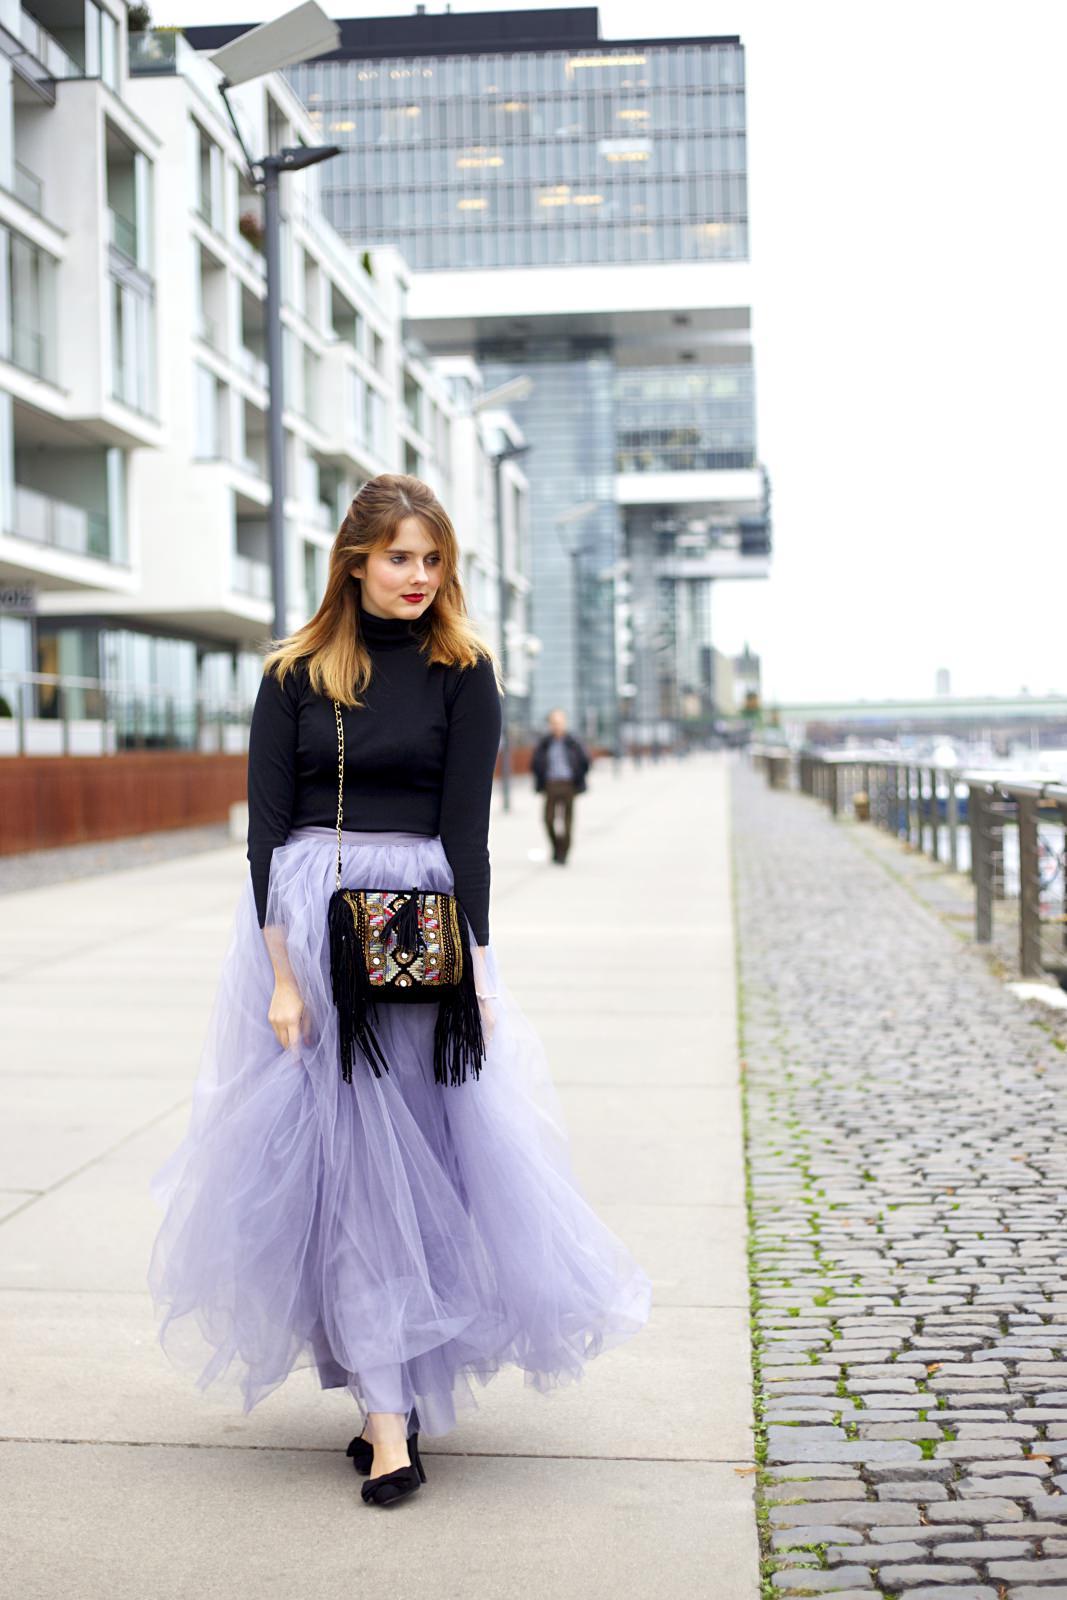 b139fde2b3f4 Outfit für glamouröse Feiertage: Der Tüllrock - Des Belles Choses ...